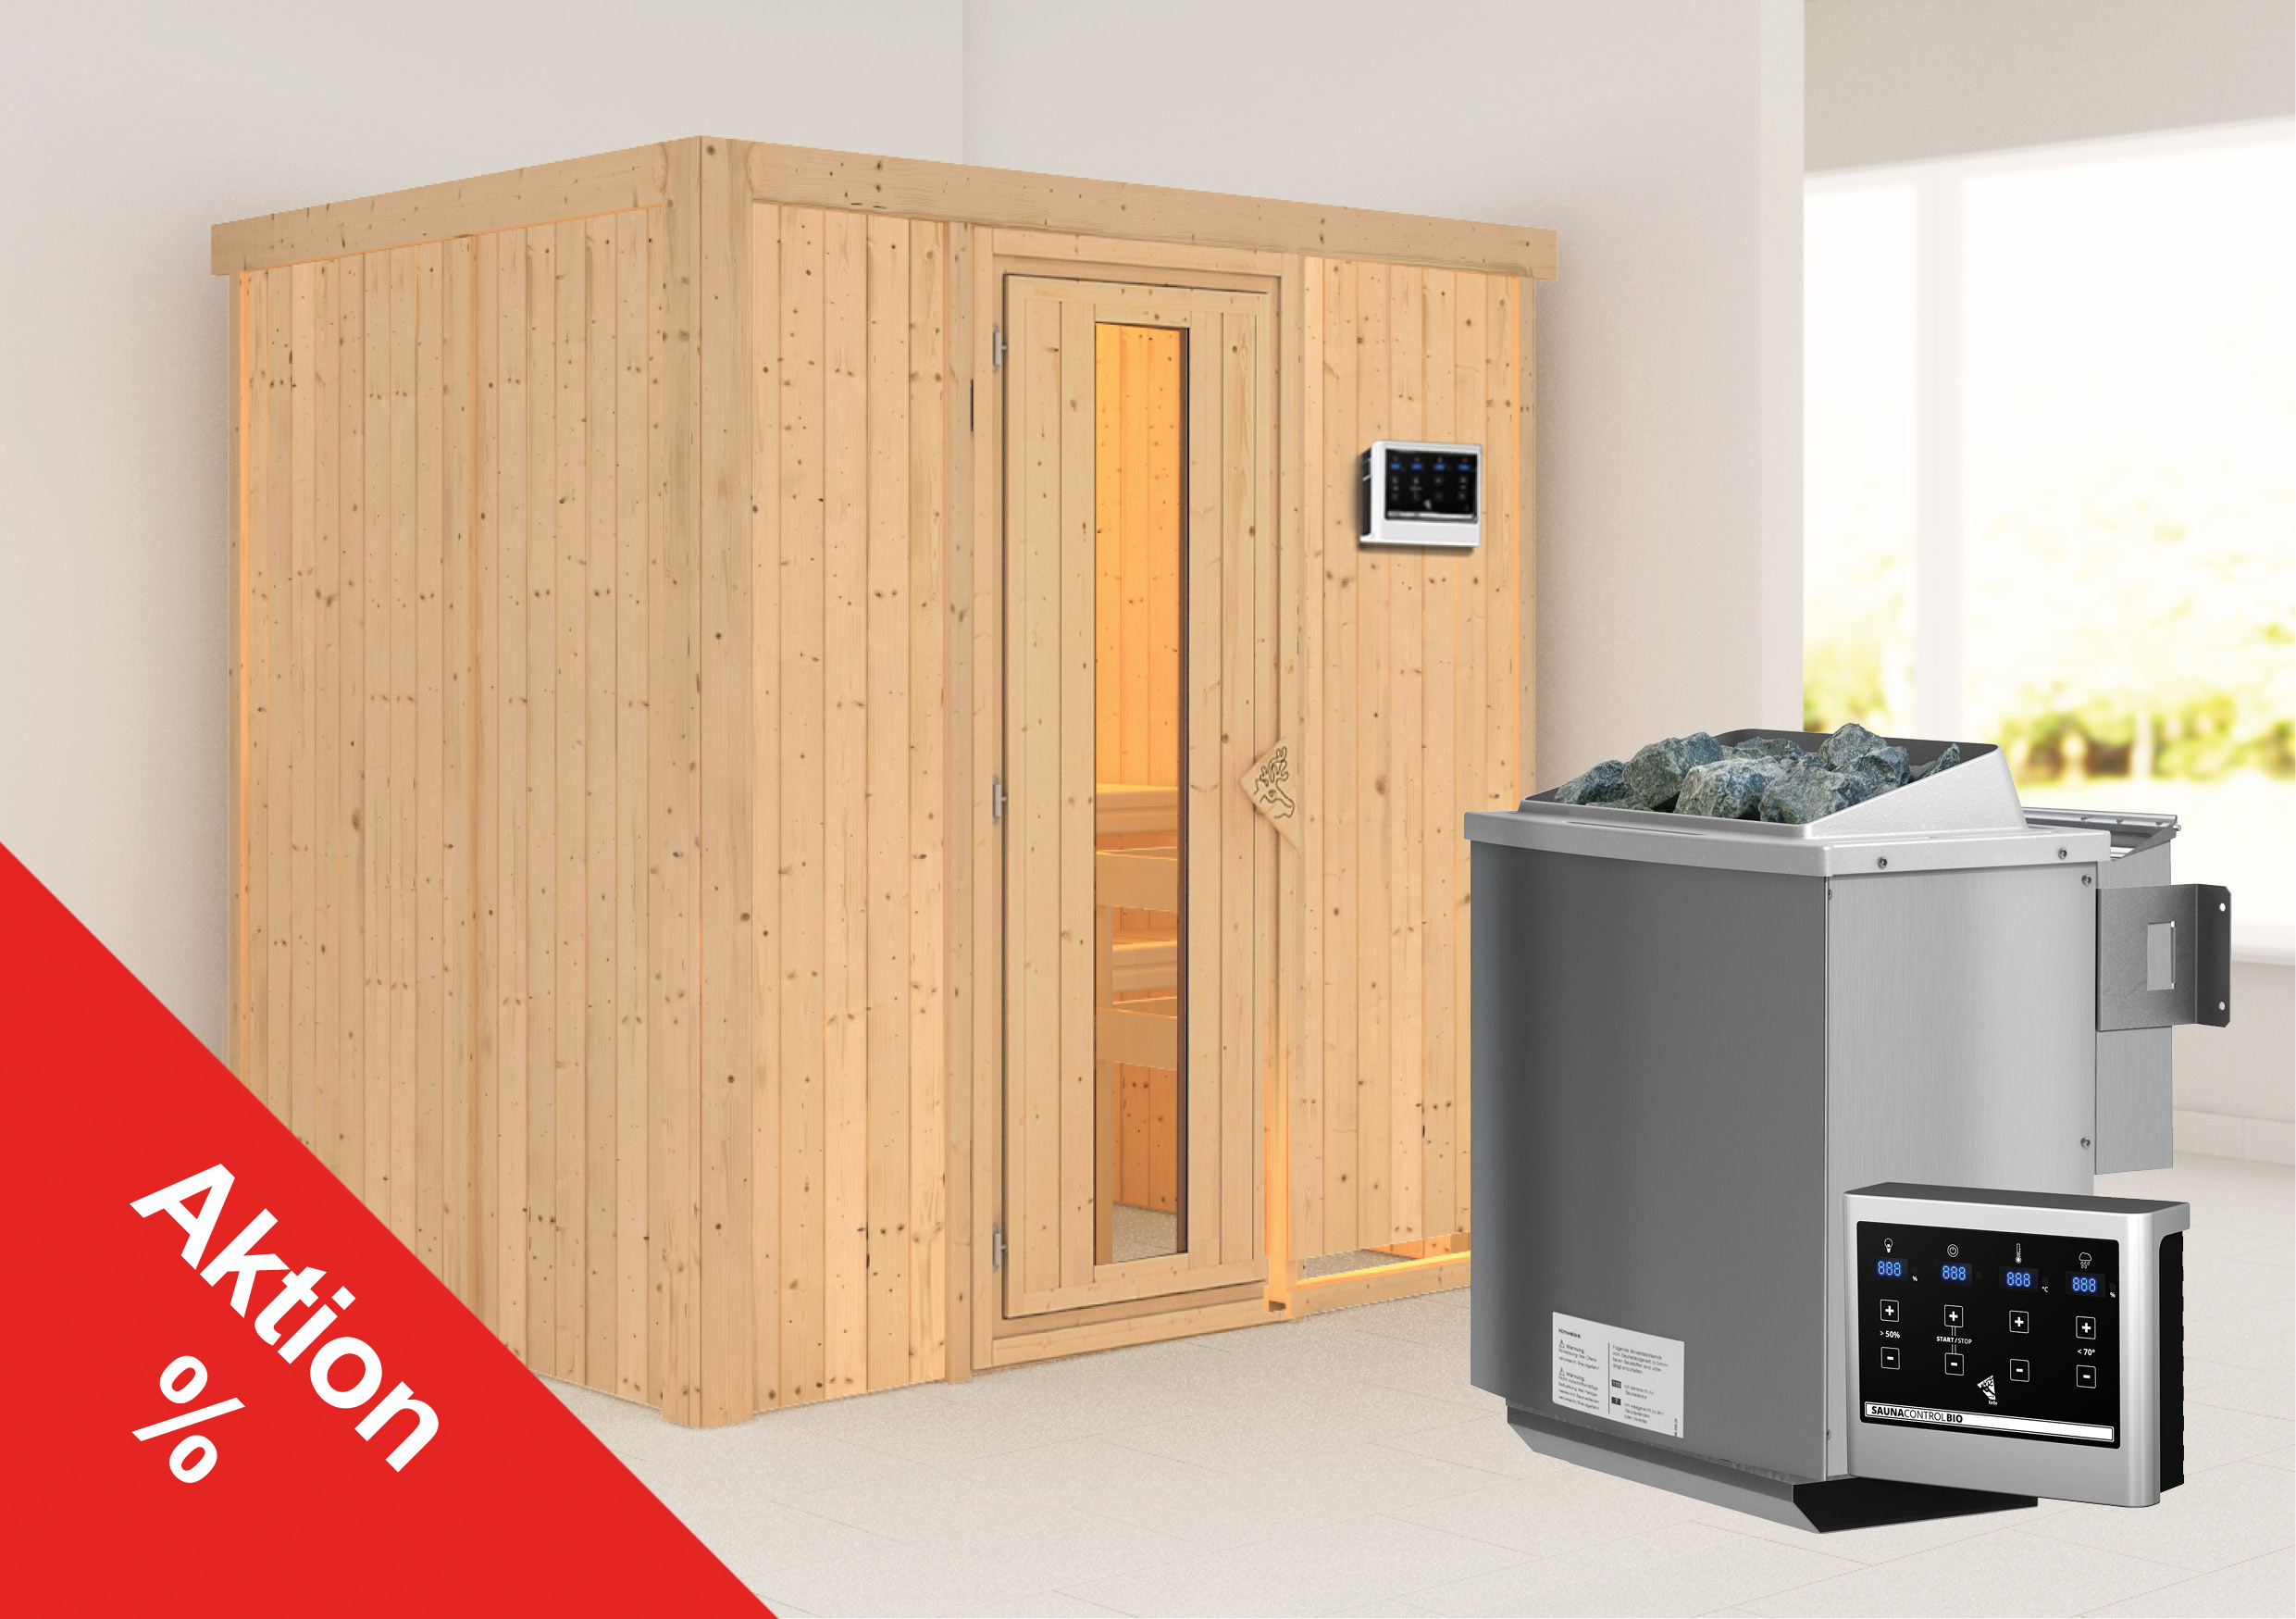 Karibu Sauna Sodina 68mm mit Bio Saunaofen 9kW extern Holztür Aktion Bild 1